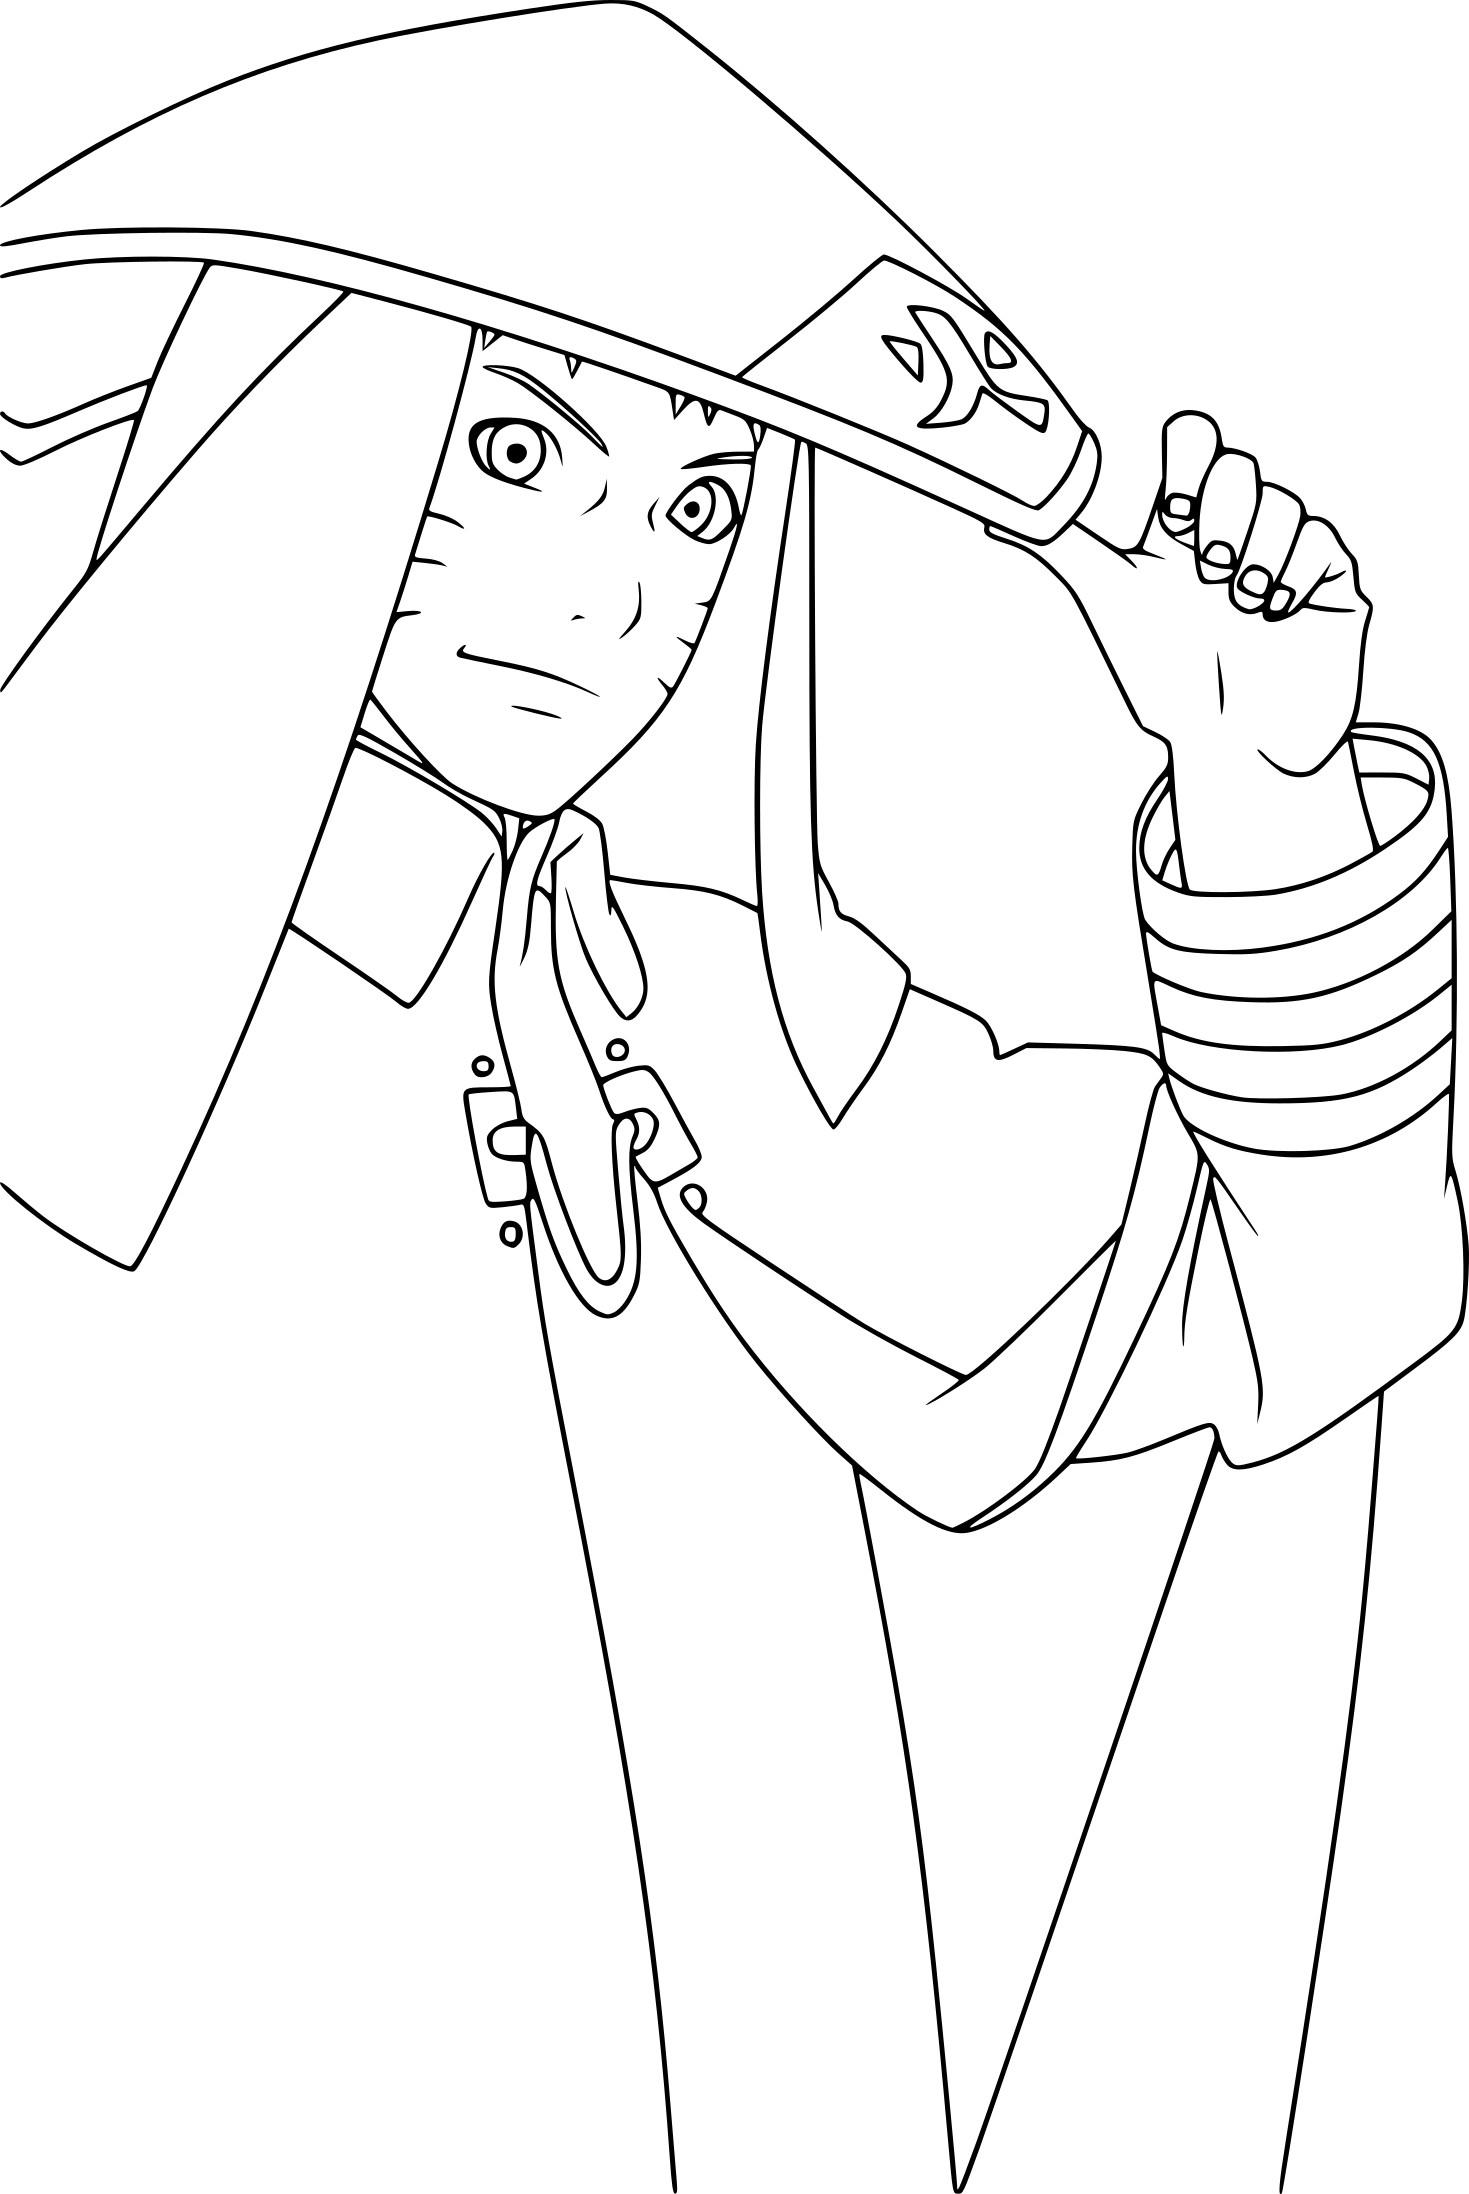 Coloriage De Naruto Hokage À Imprimer Sur Coloriage De tout Dessin Naruto Shippuden A Imprimer